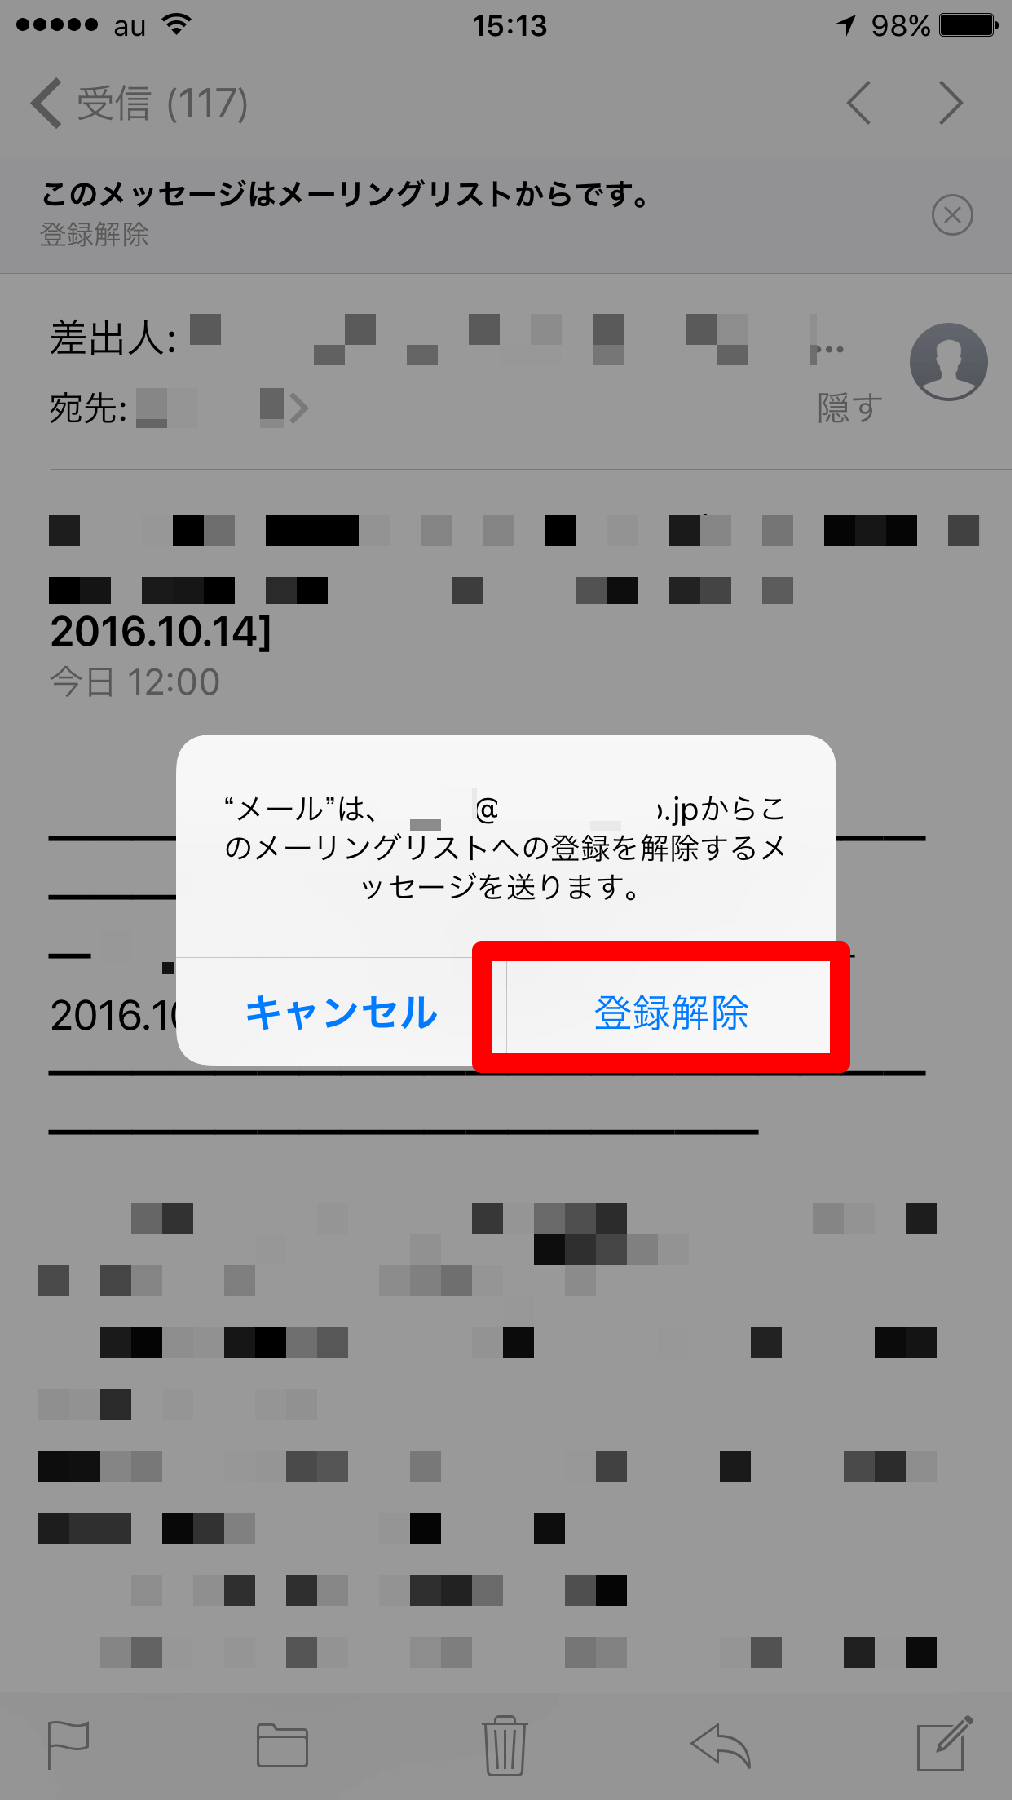 iPhoneのメールアプリのメルマガ登録解除機能のメッセージ送信画面